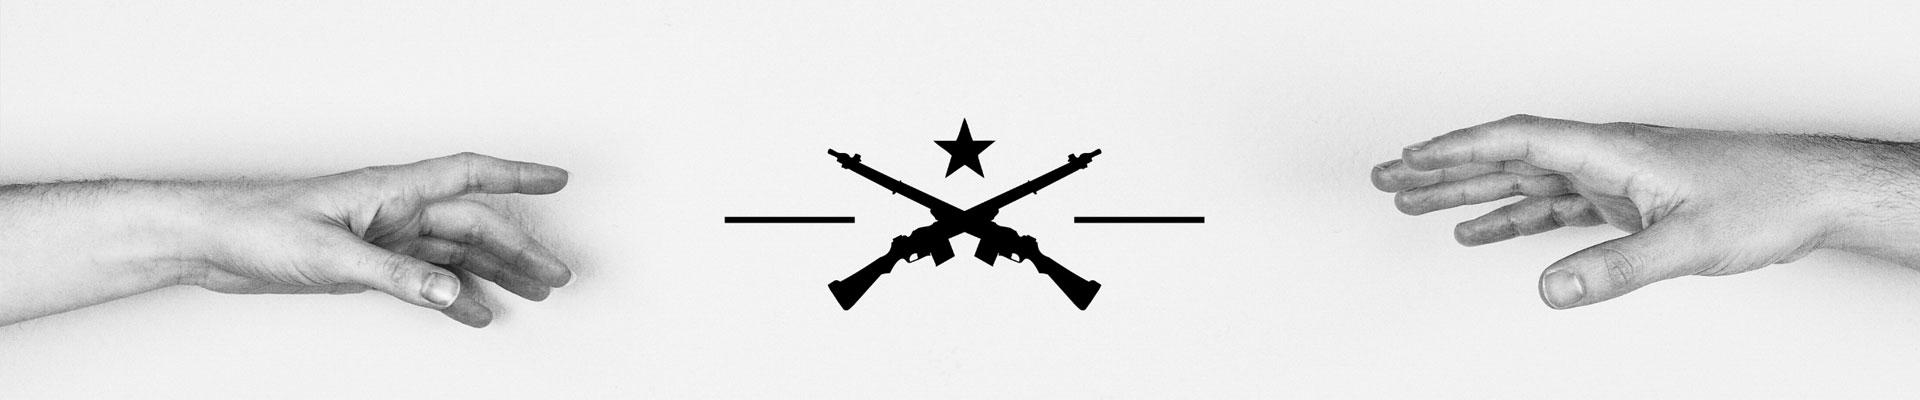 A black star symbol above two riffles crossing their barrels